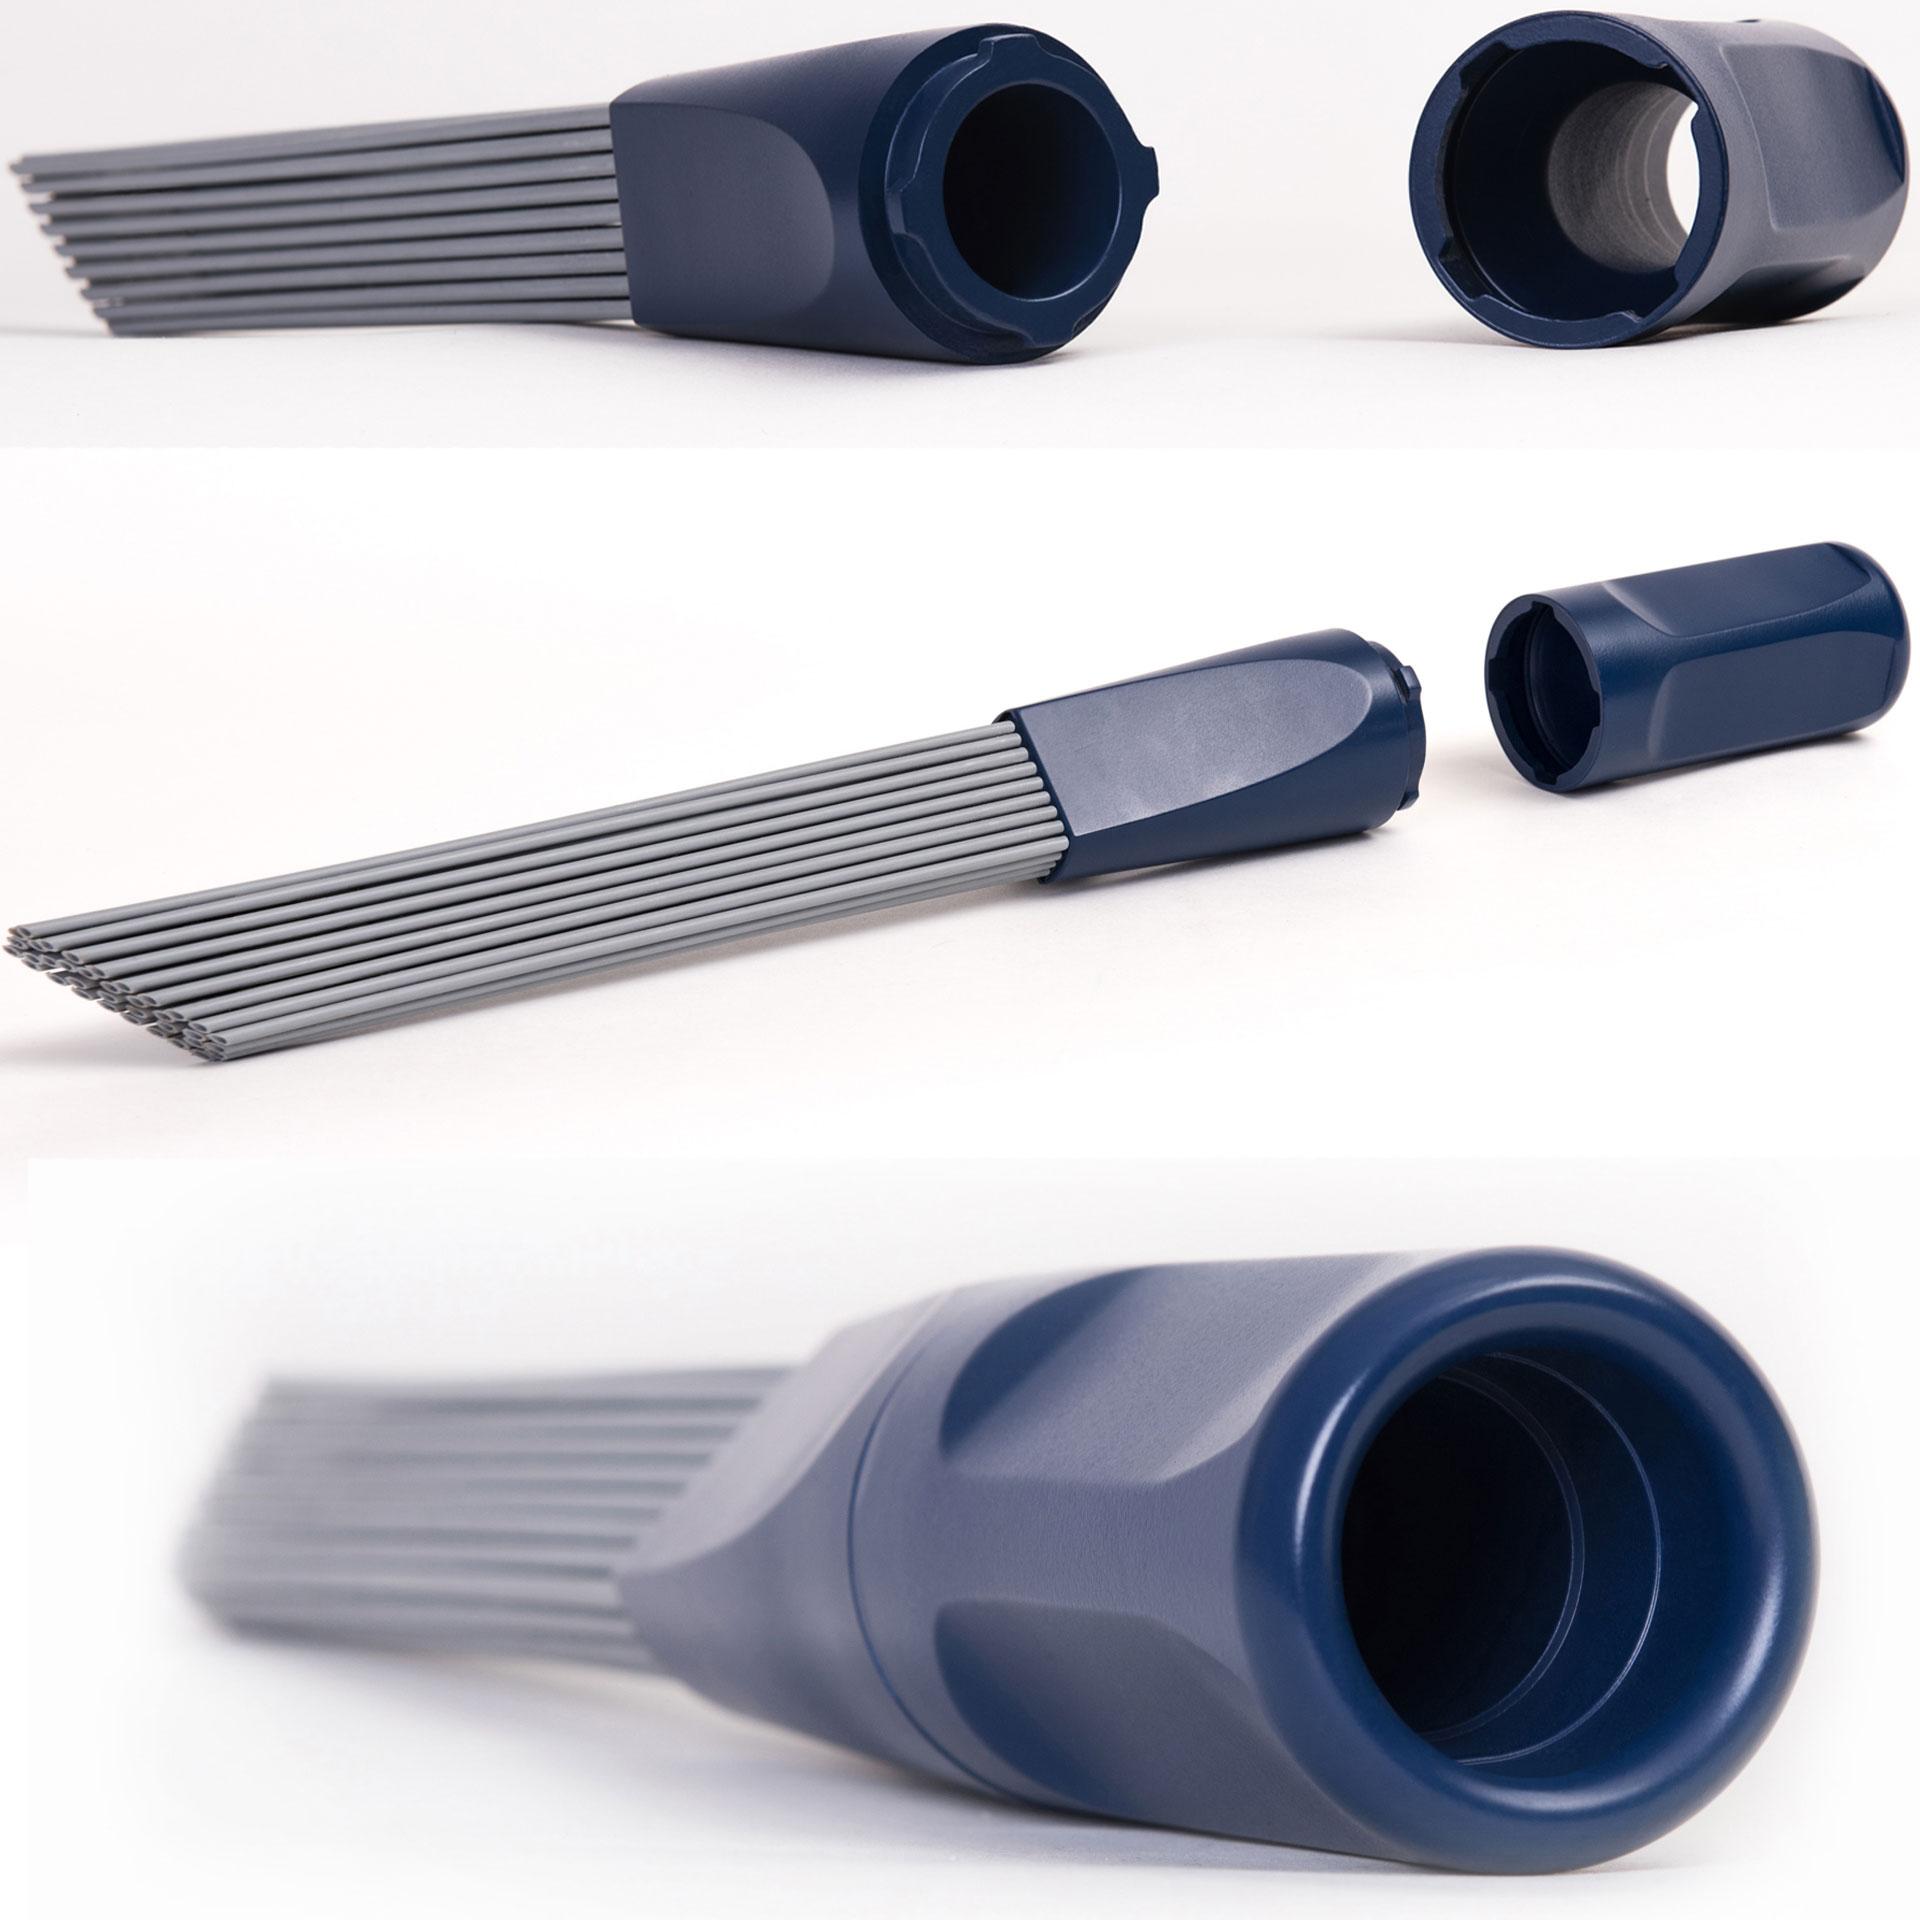 Dusty-Brush Staubsaugeraufsatz Regular - Düse 2,8mm Bild 2